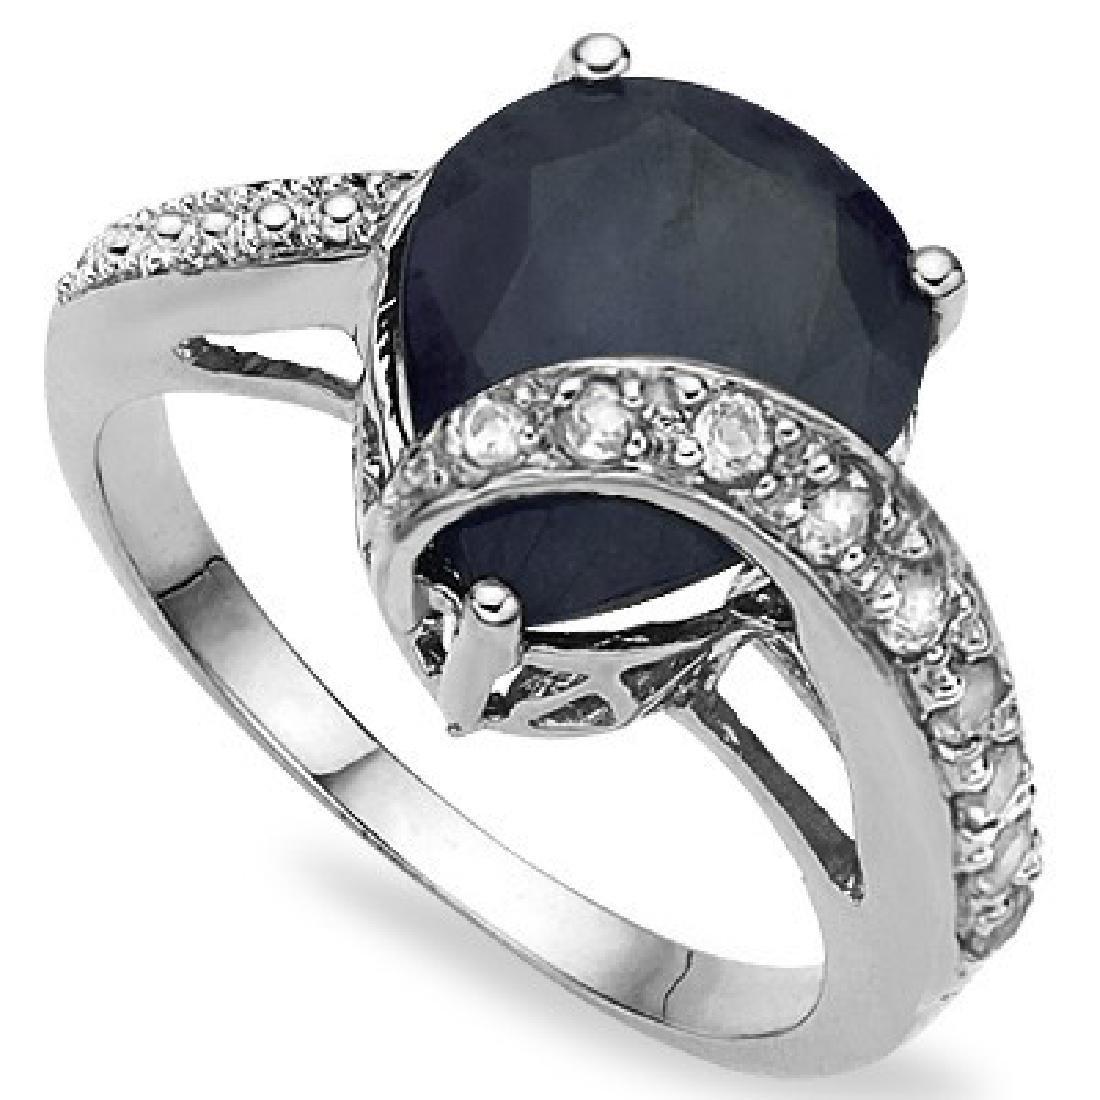 DIAMOND ACCENT 5CT BLACK SAPPHIRE RING